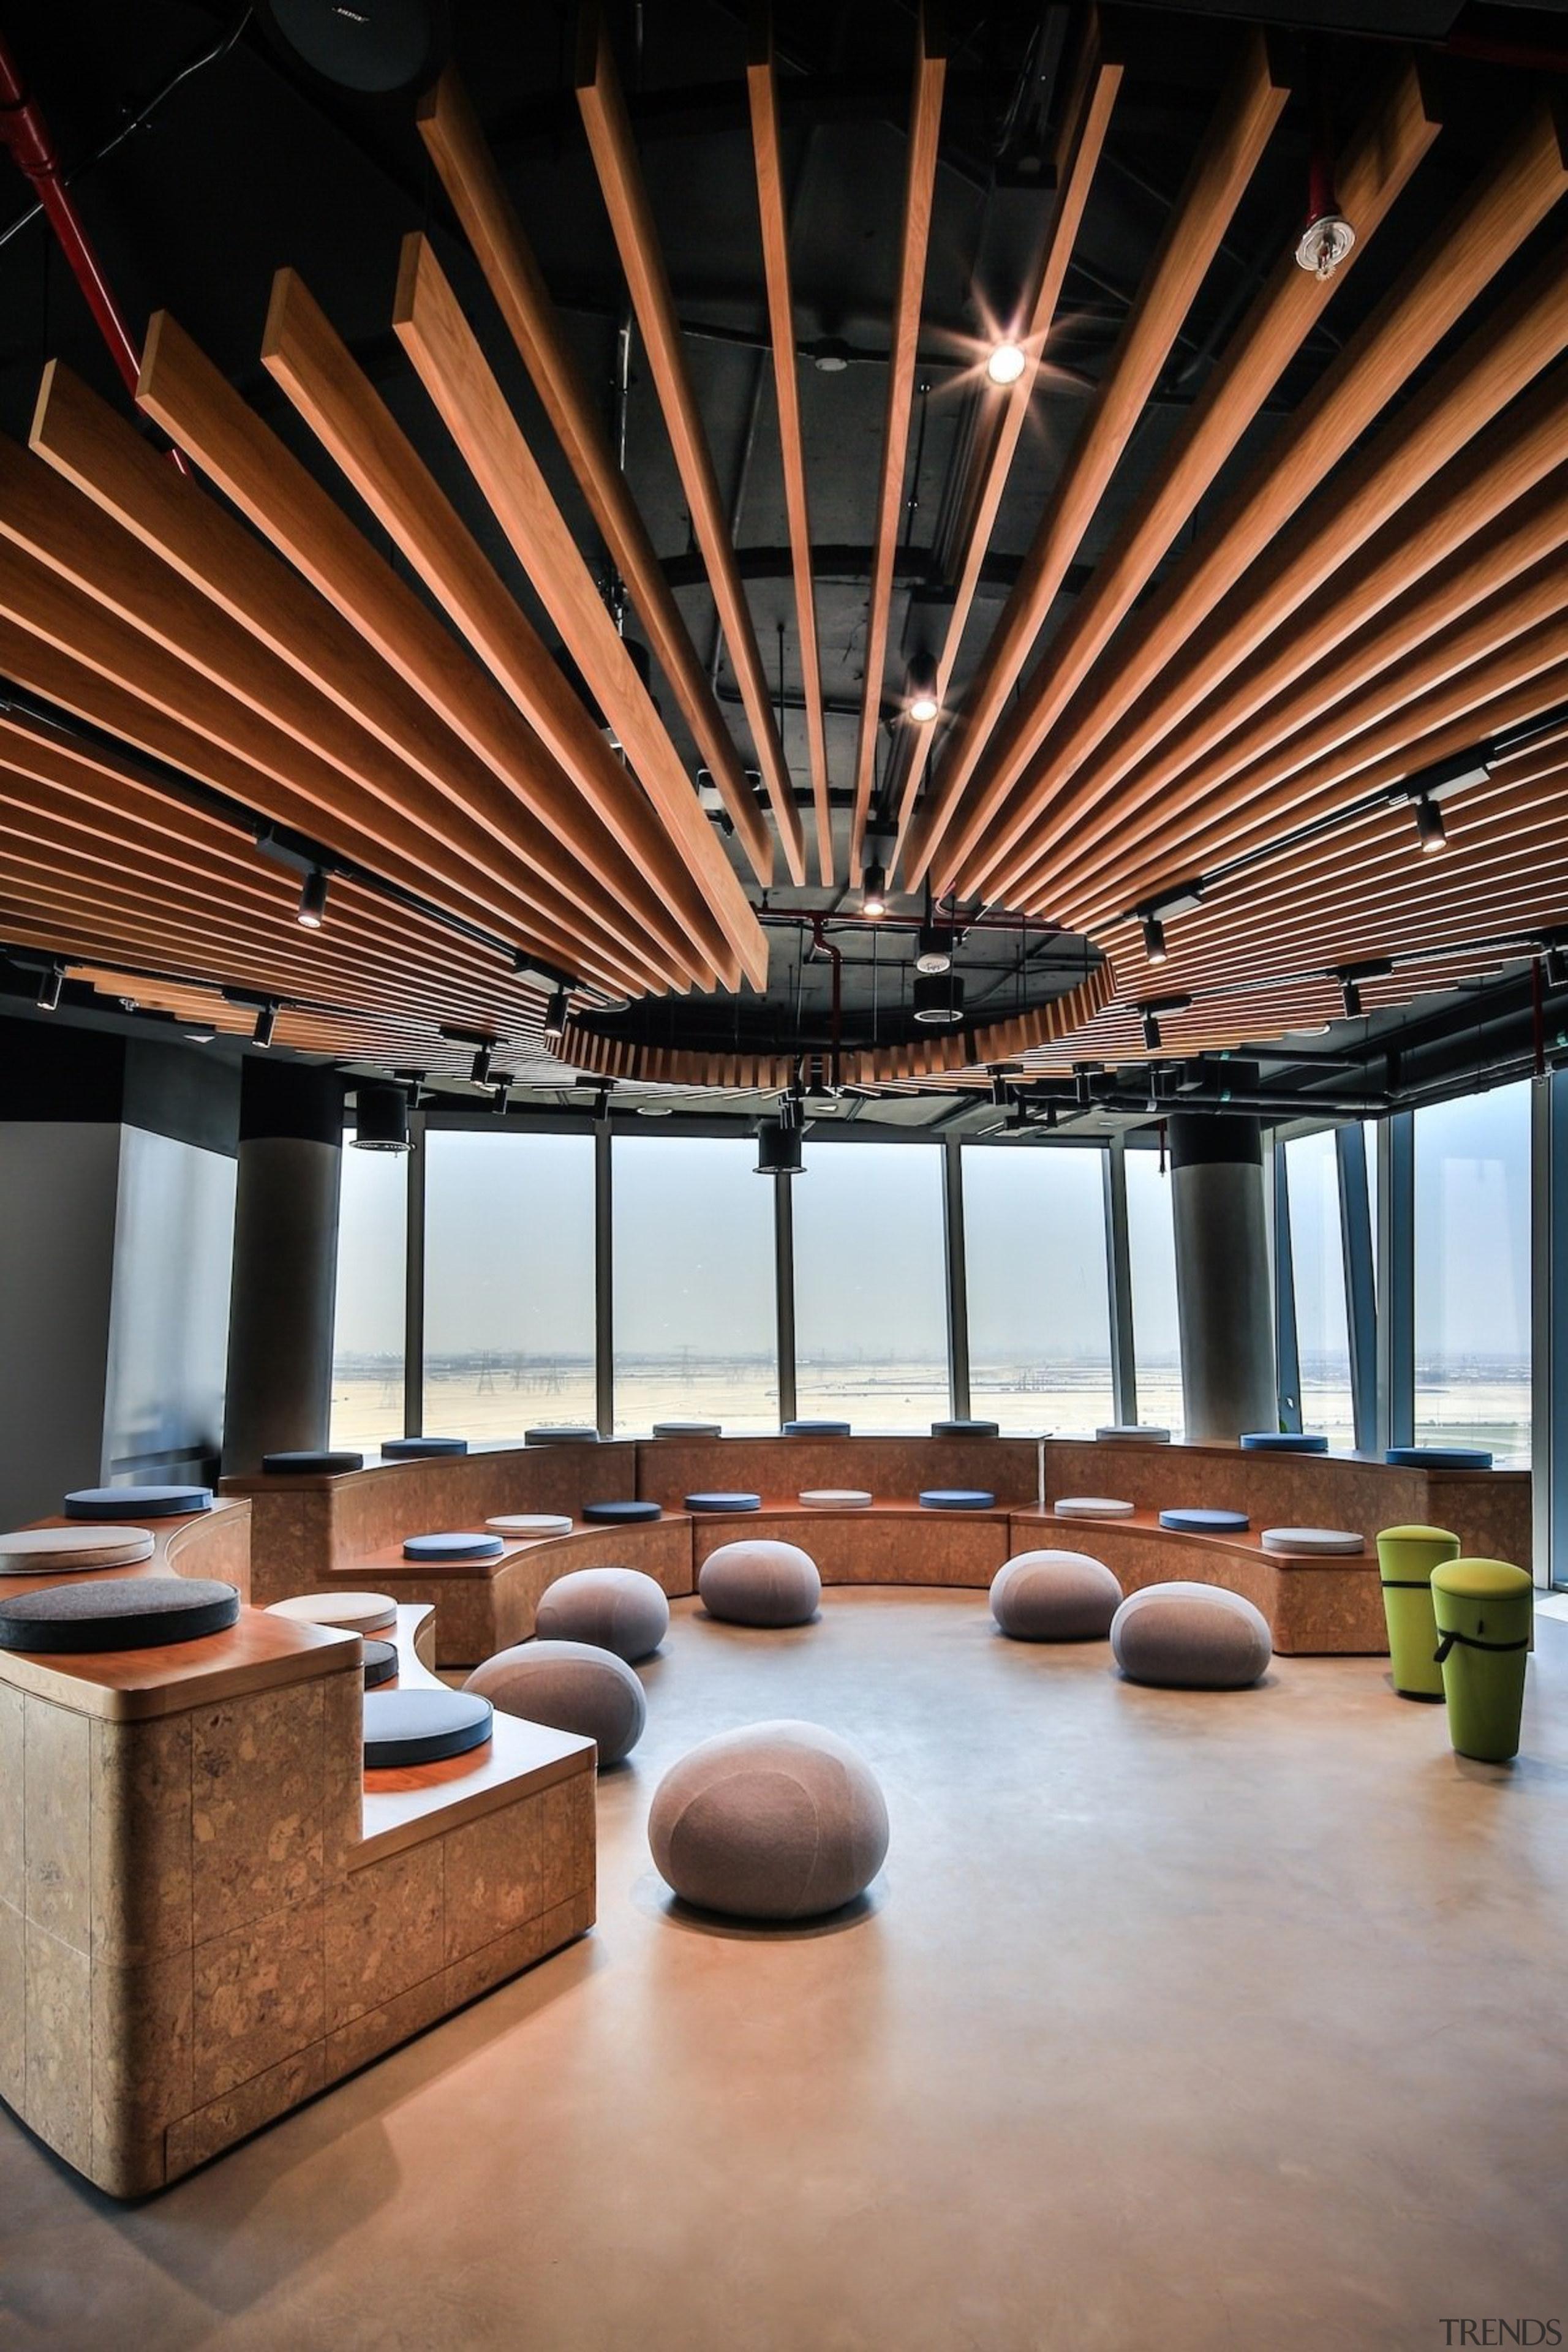 Smart Dubai - Smart Dubai - architecture | architecture, ceiling, daylighting, furniture, interior design, lobby, table, brown